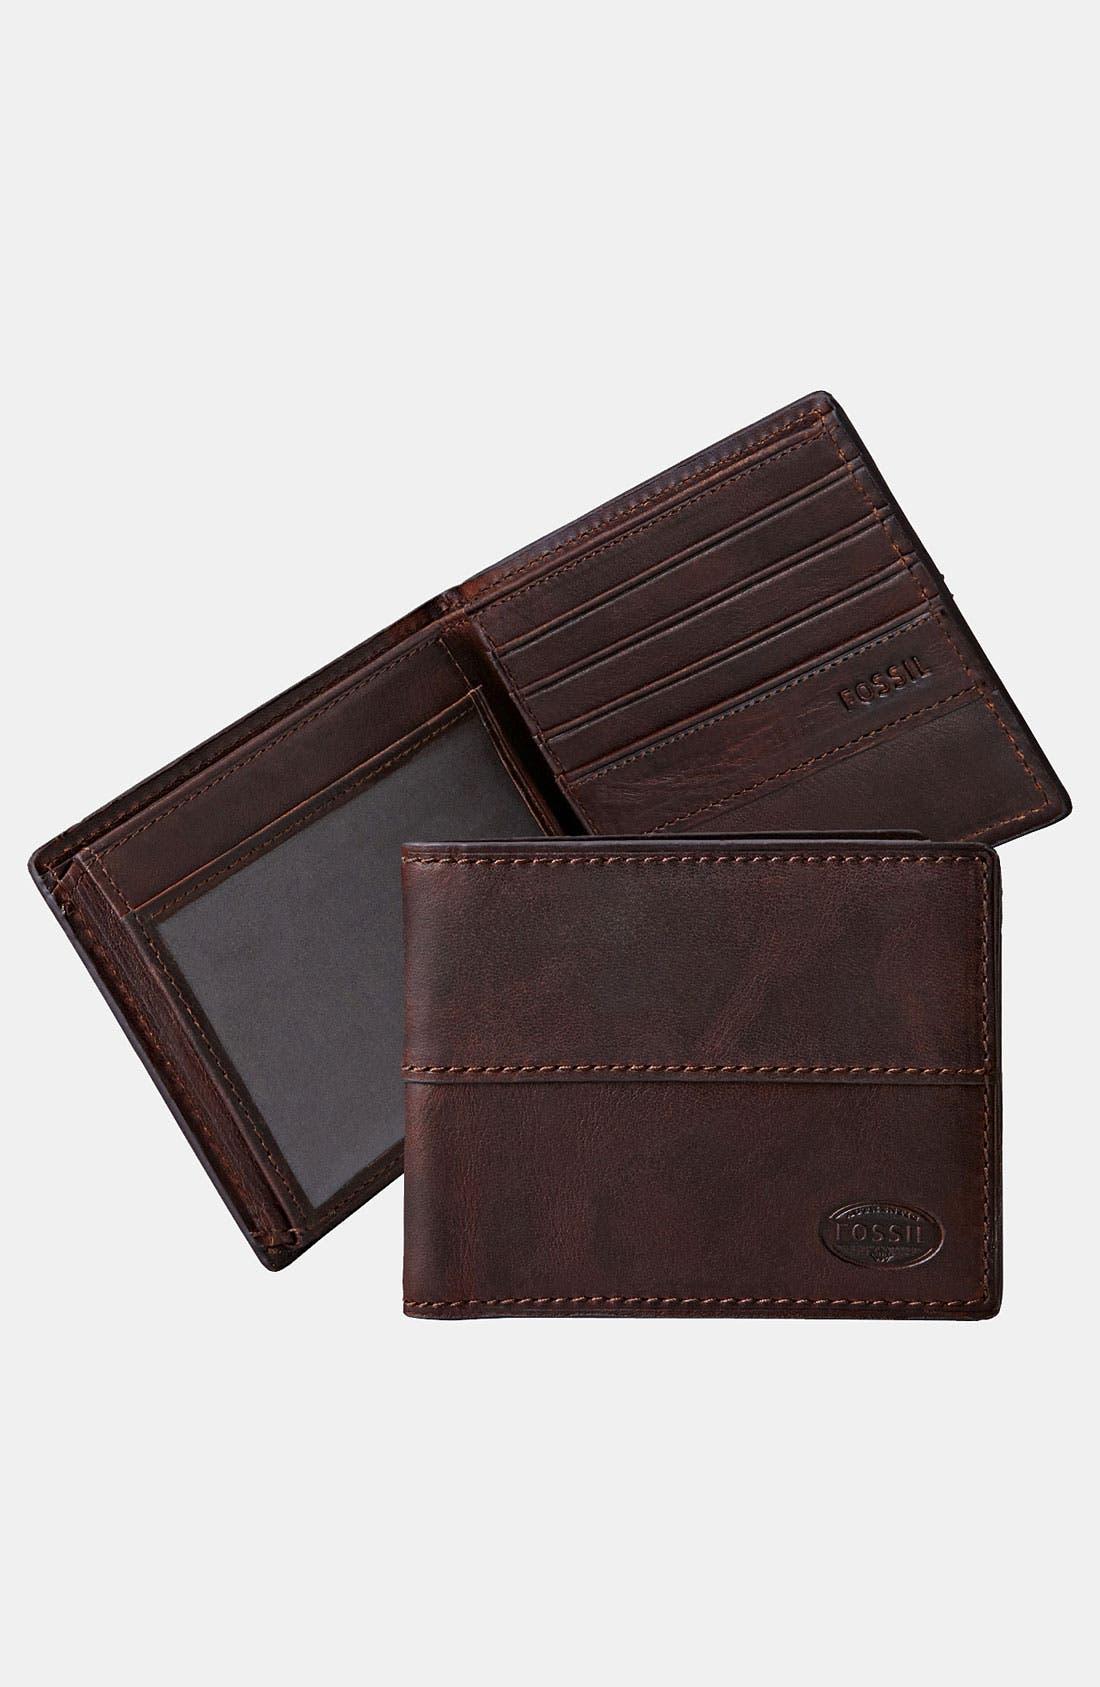 Main Image - Fossil 'Dillon' Traveler Wallet